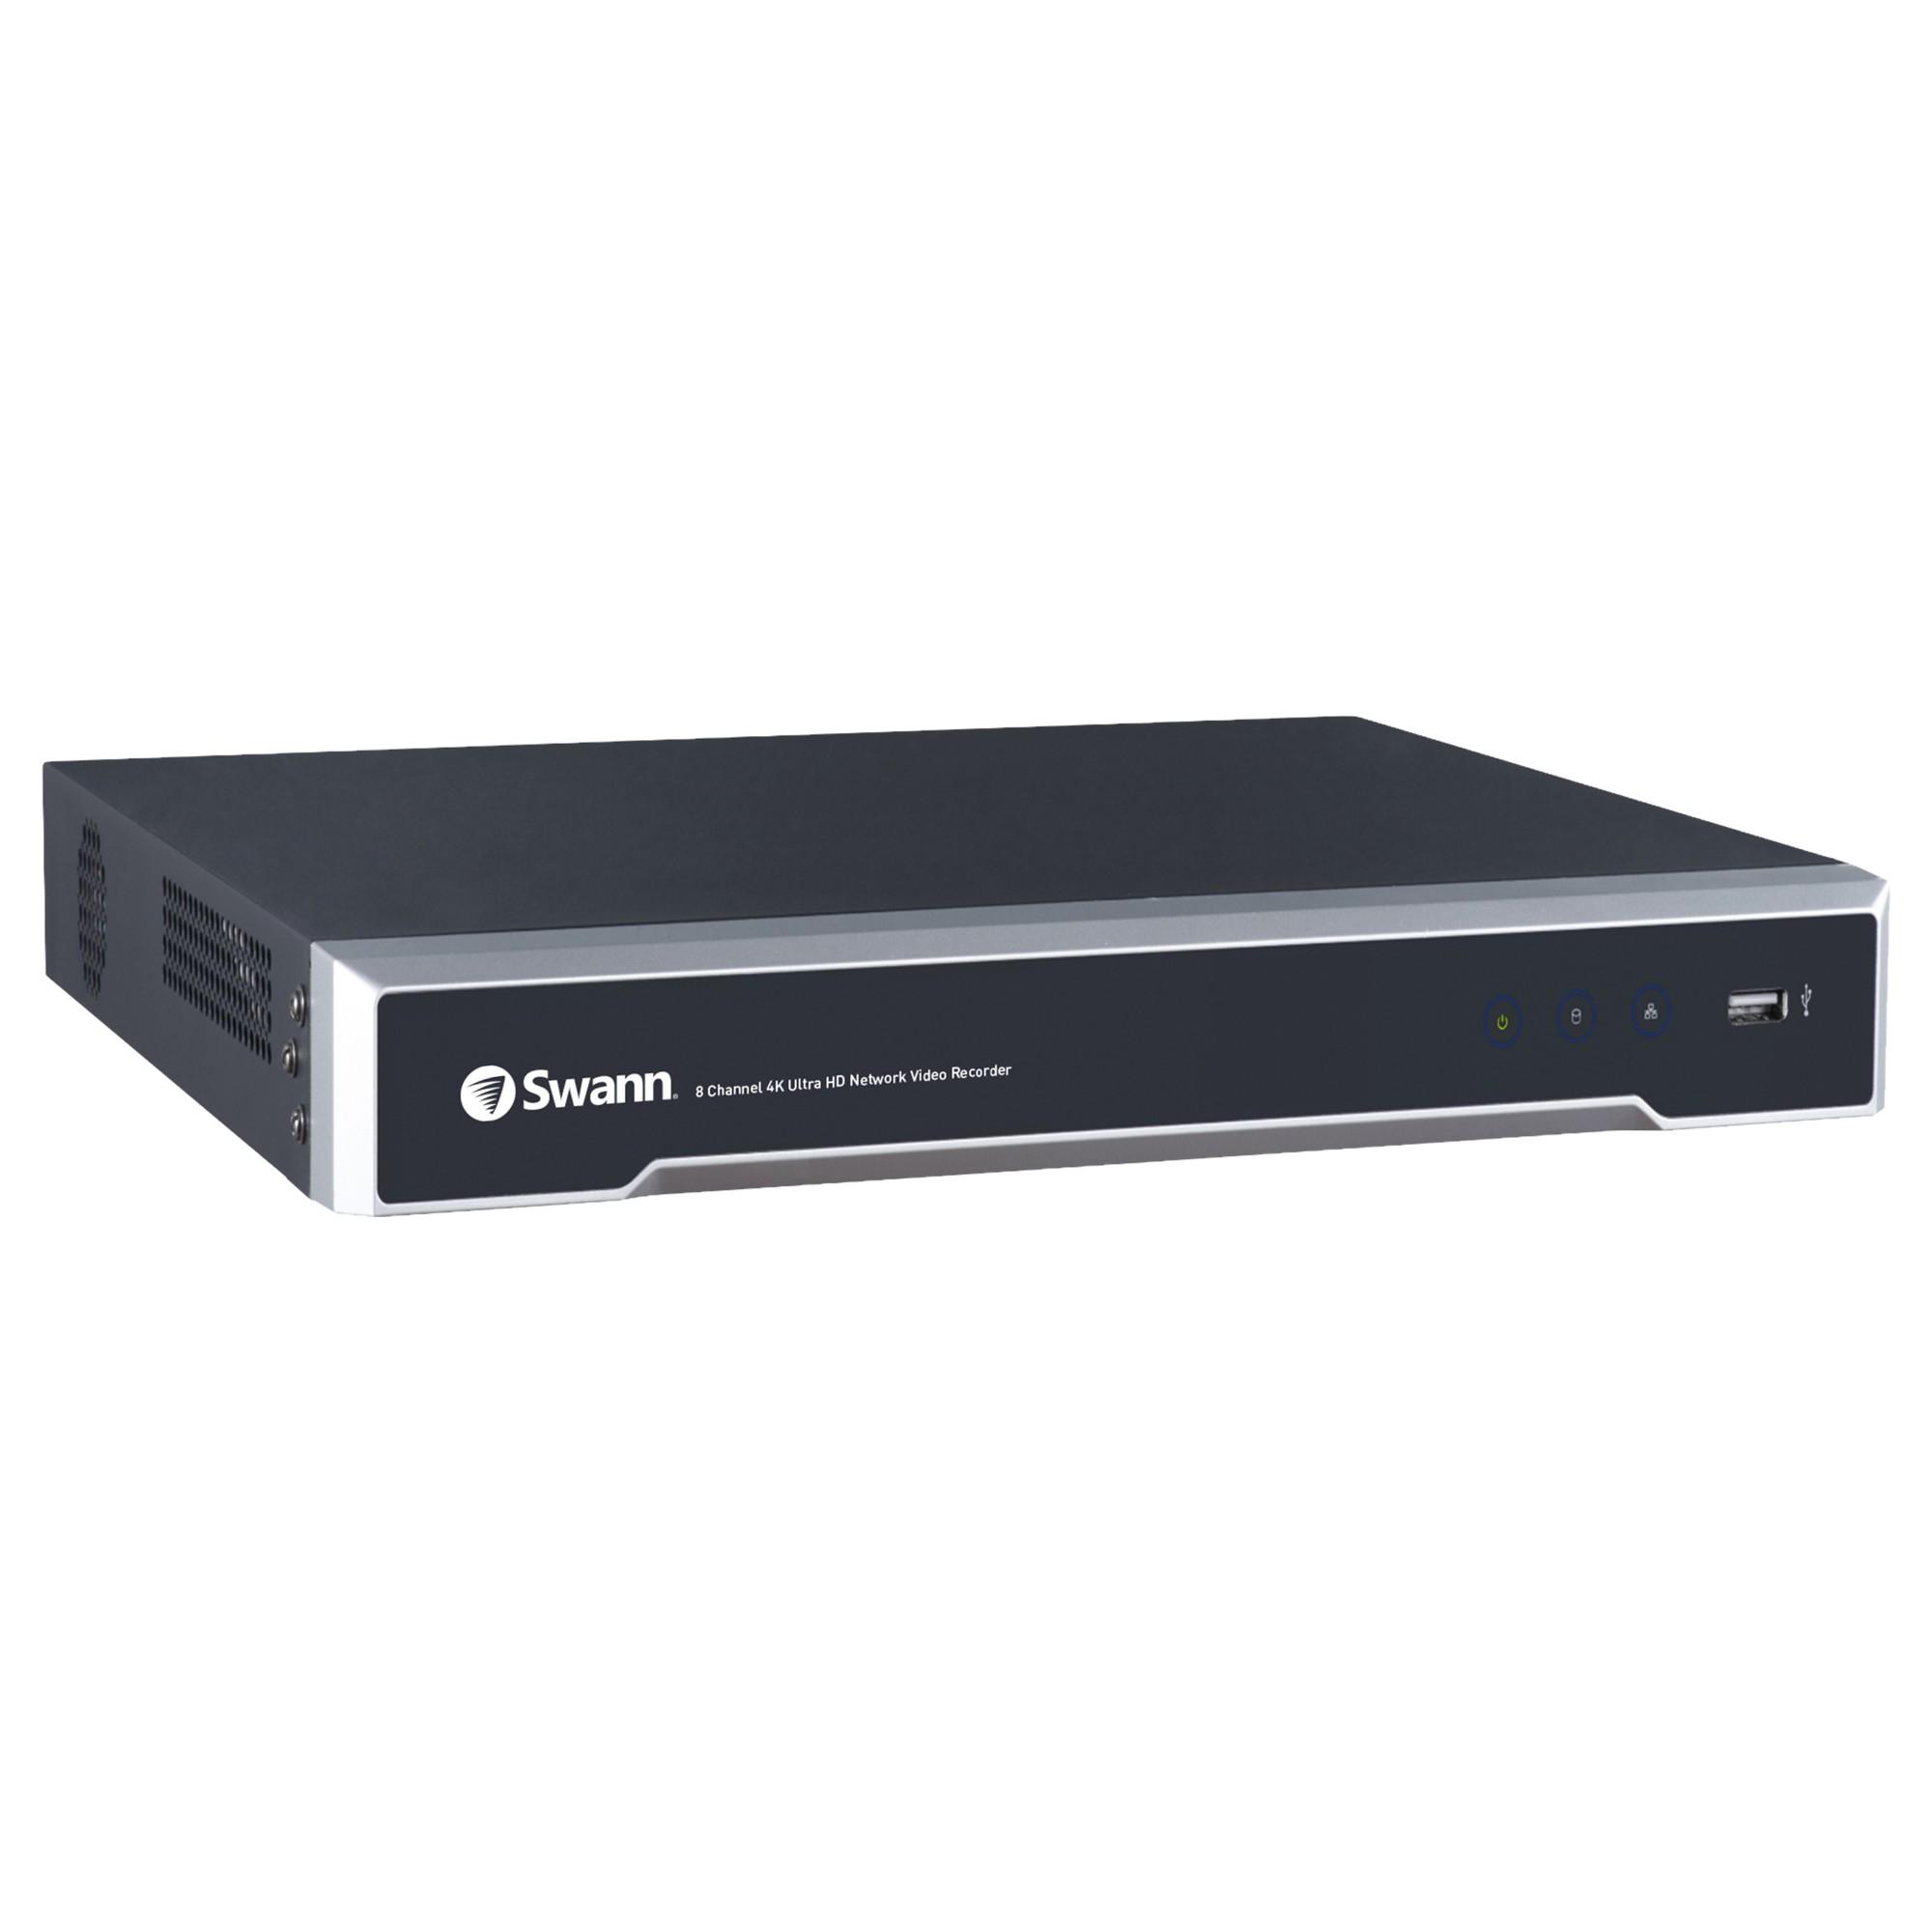 Swann NVR-8000 Black network video recorder